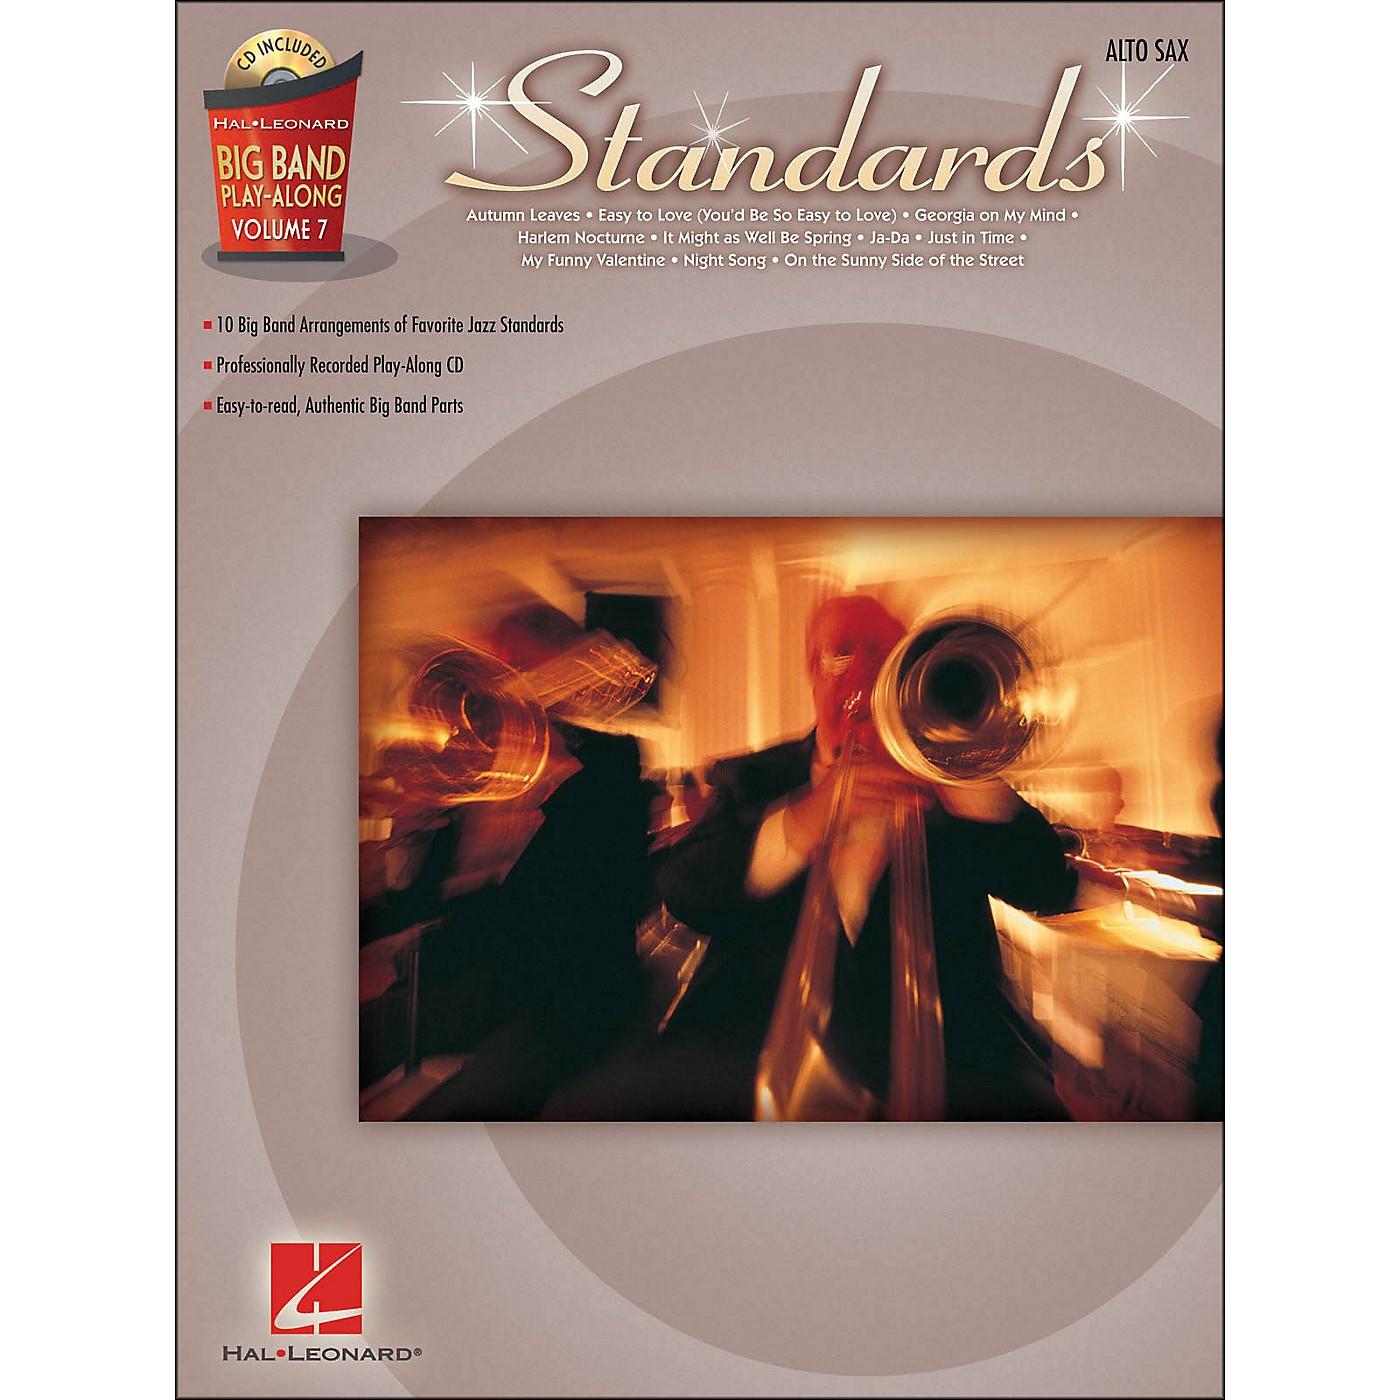 Hal Leonard Standards - Big Band Play-Along Vol. 7 Alto Sax thumbnail